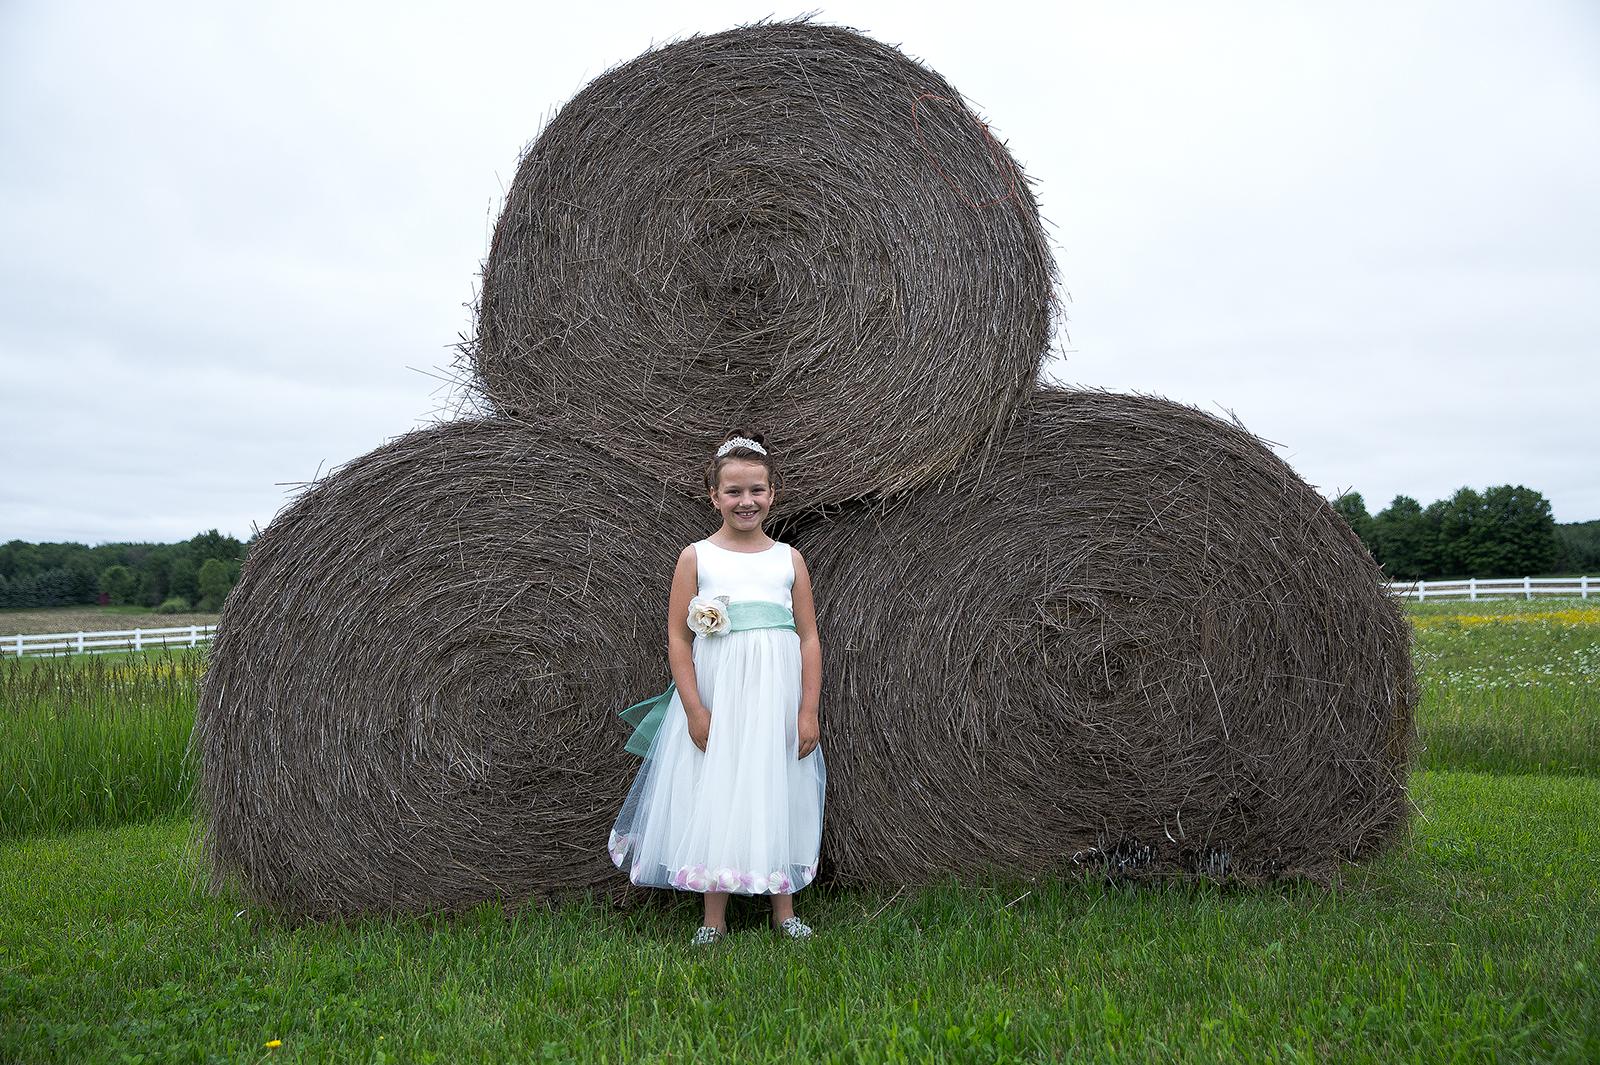 daughter solo bale#1(WEB).jpg